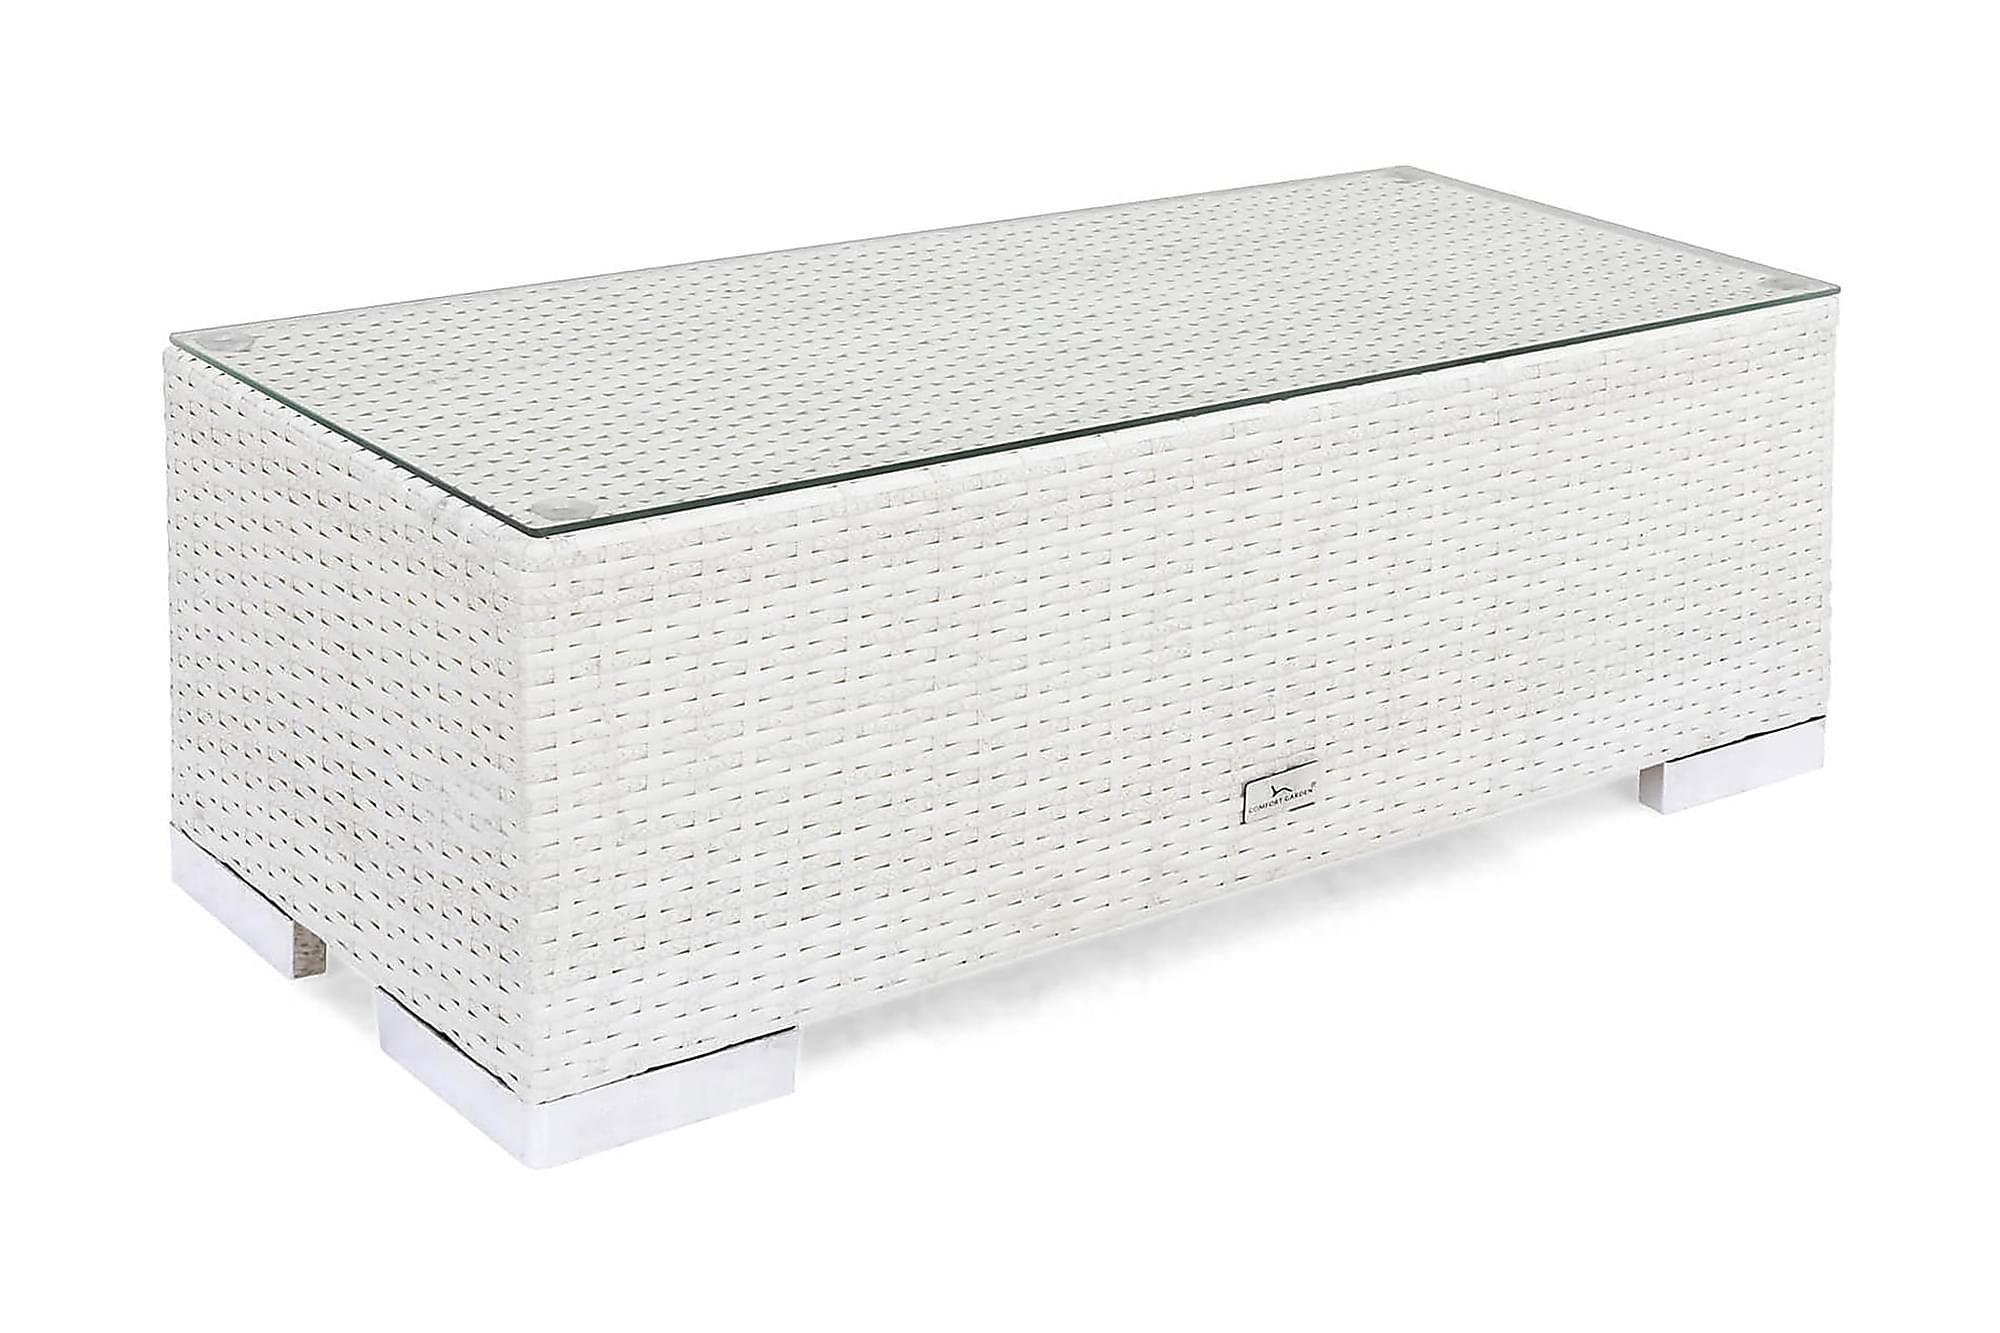 BAHAMAS Avslut 38x90 cm Vit, Loungemöbler